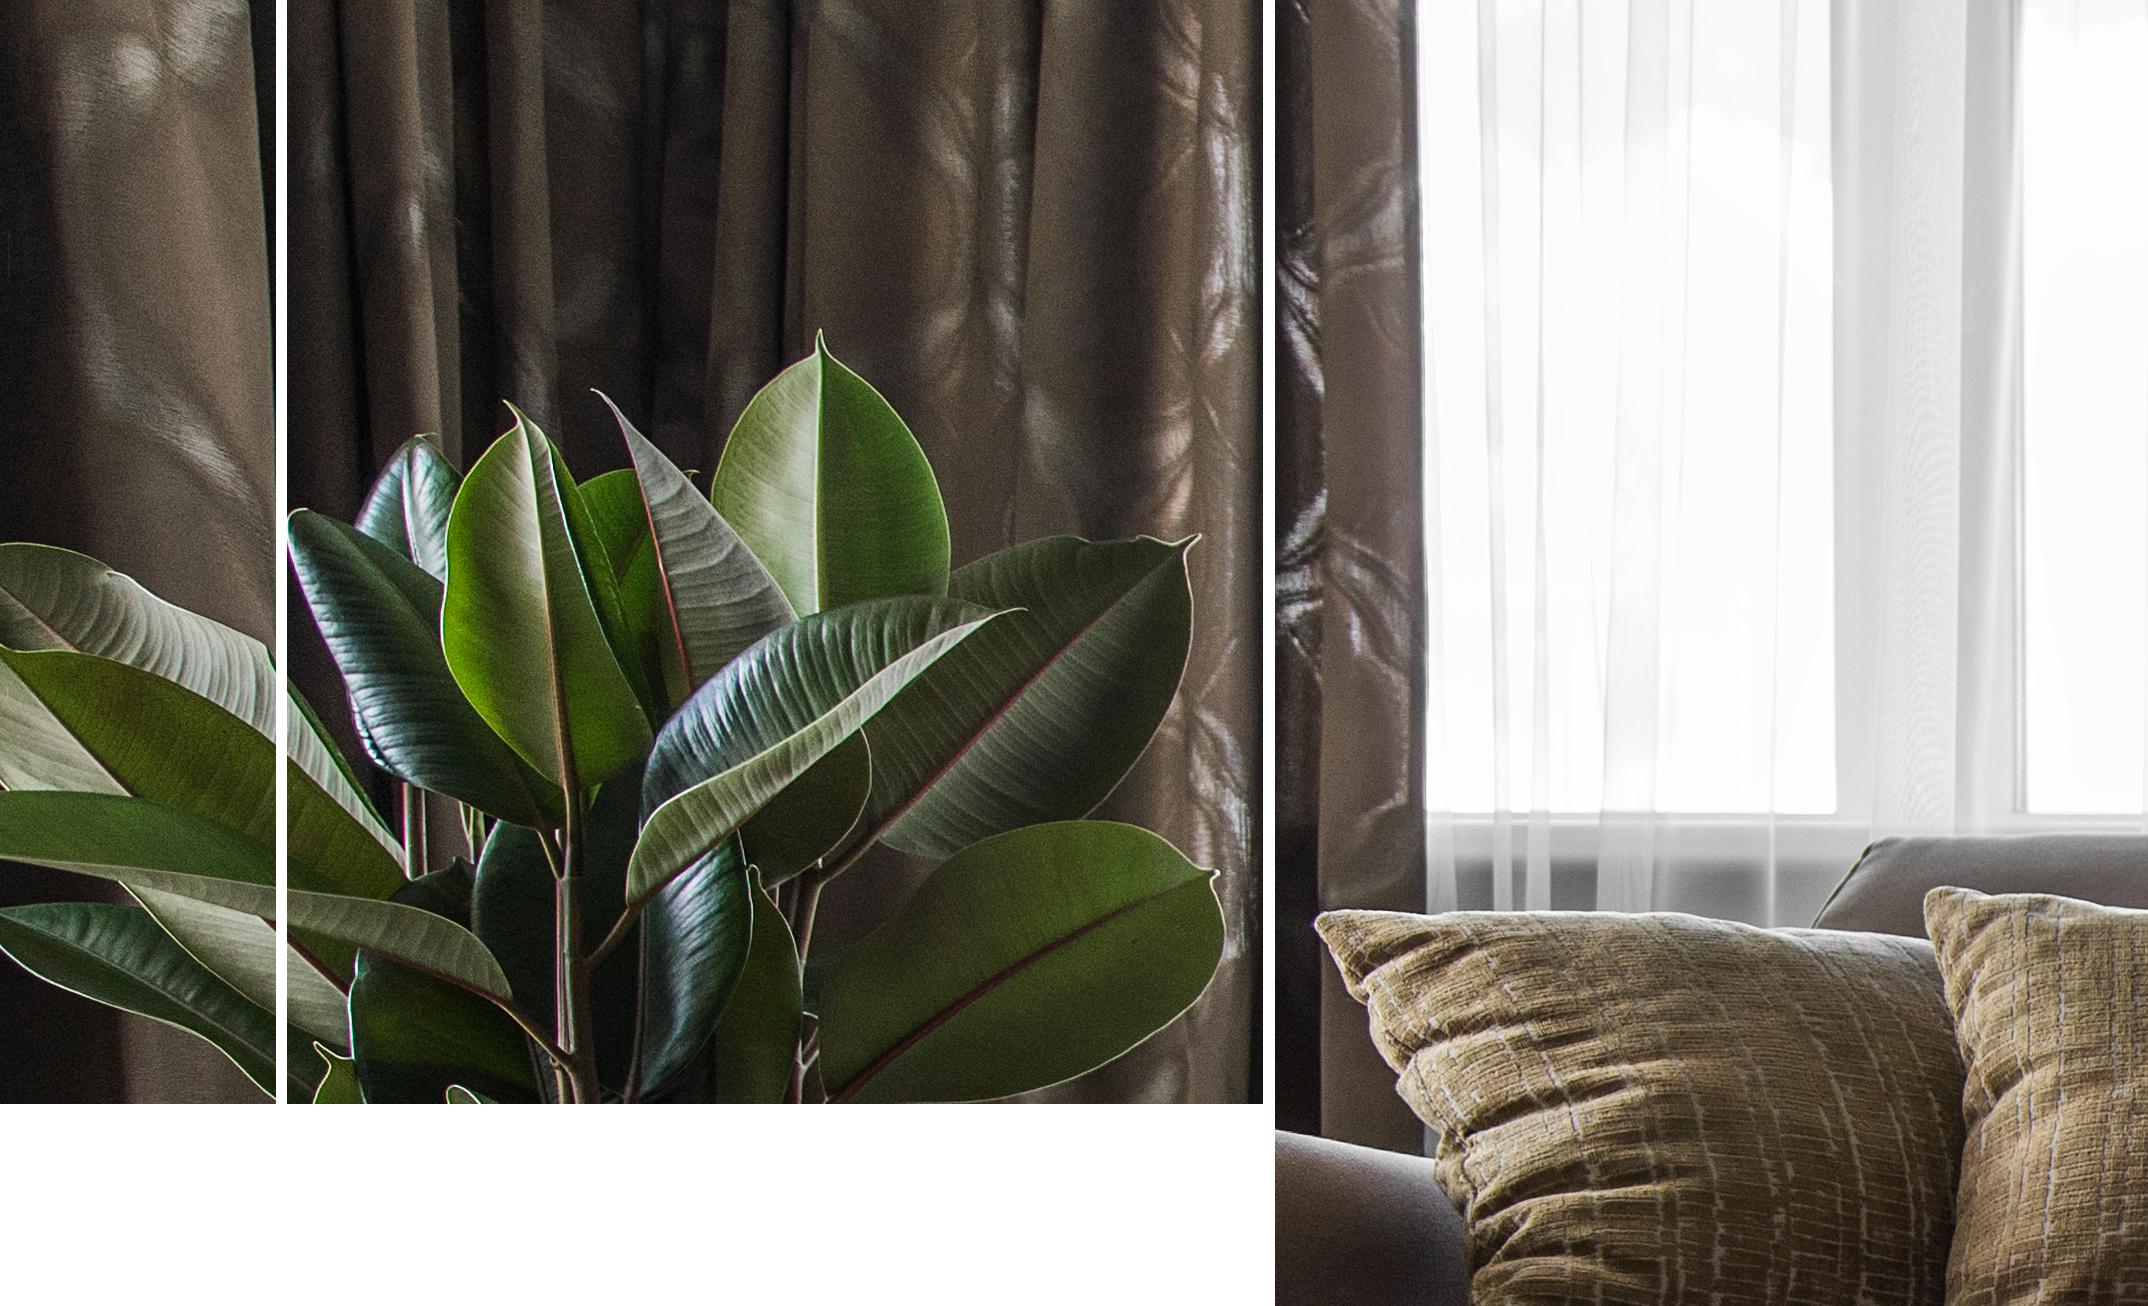 EJtekstile–-interjero-tekstiles-projektavimo-studija--Interior-textile-design-studio-4.2